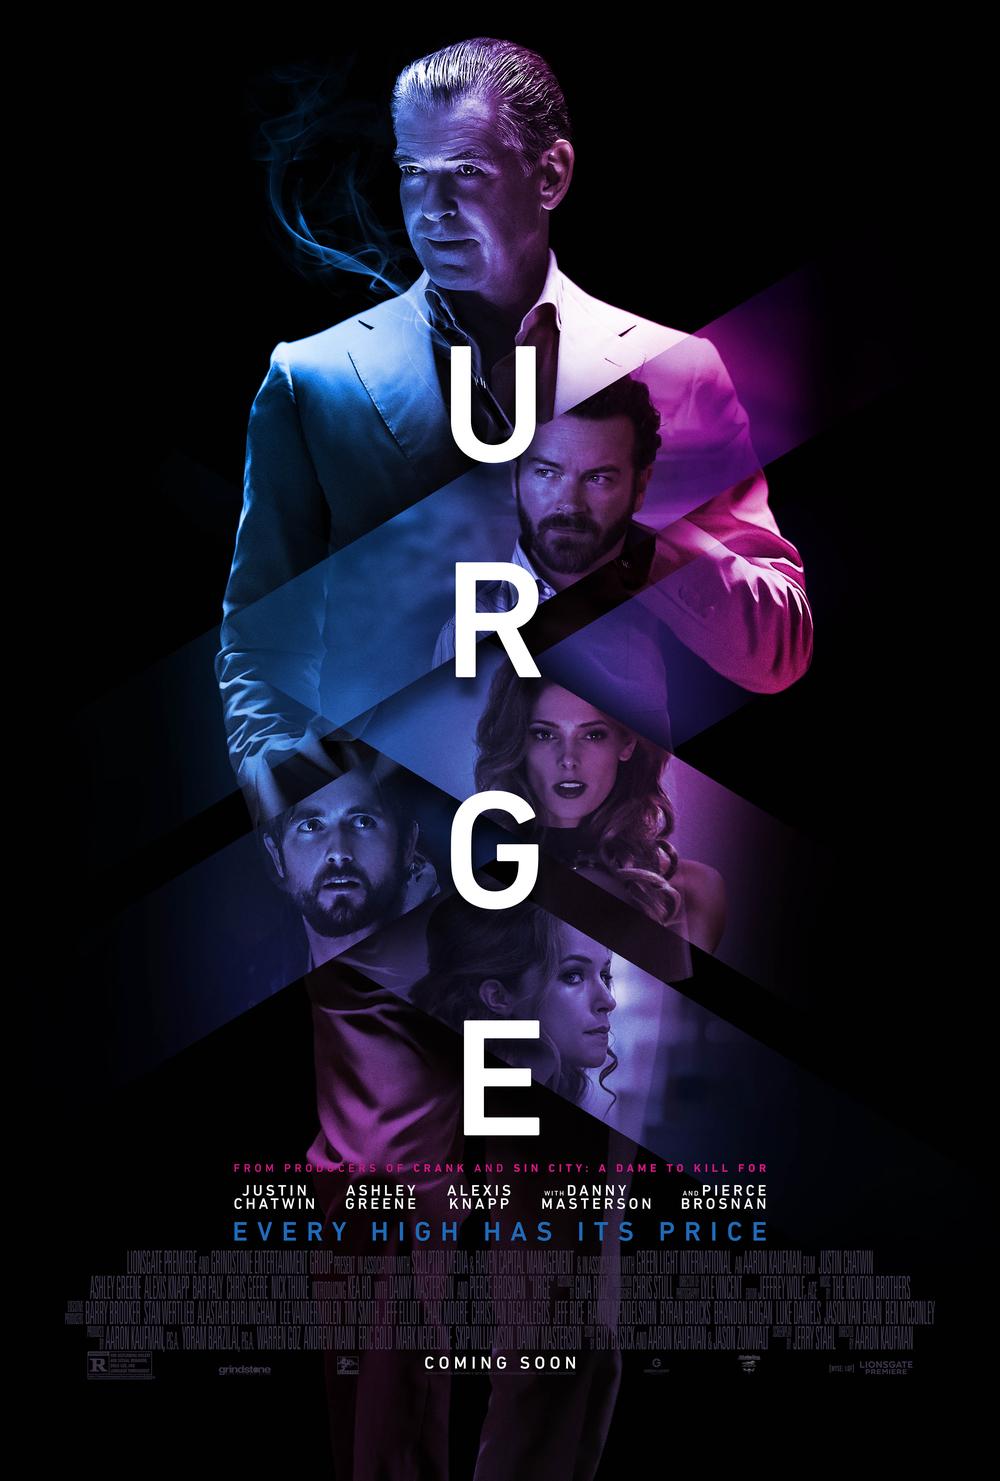 URGE final poster.jpg